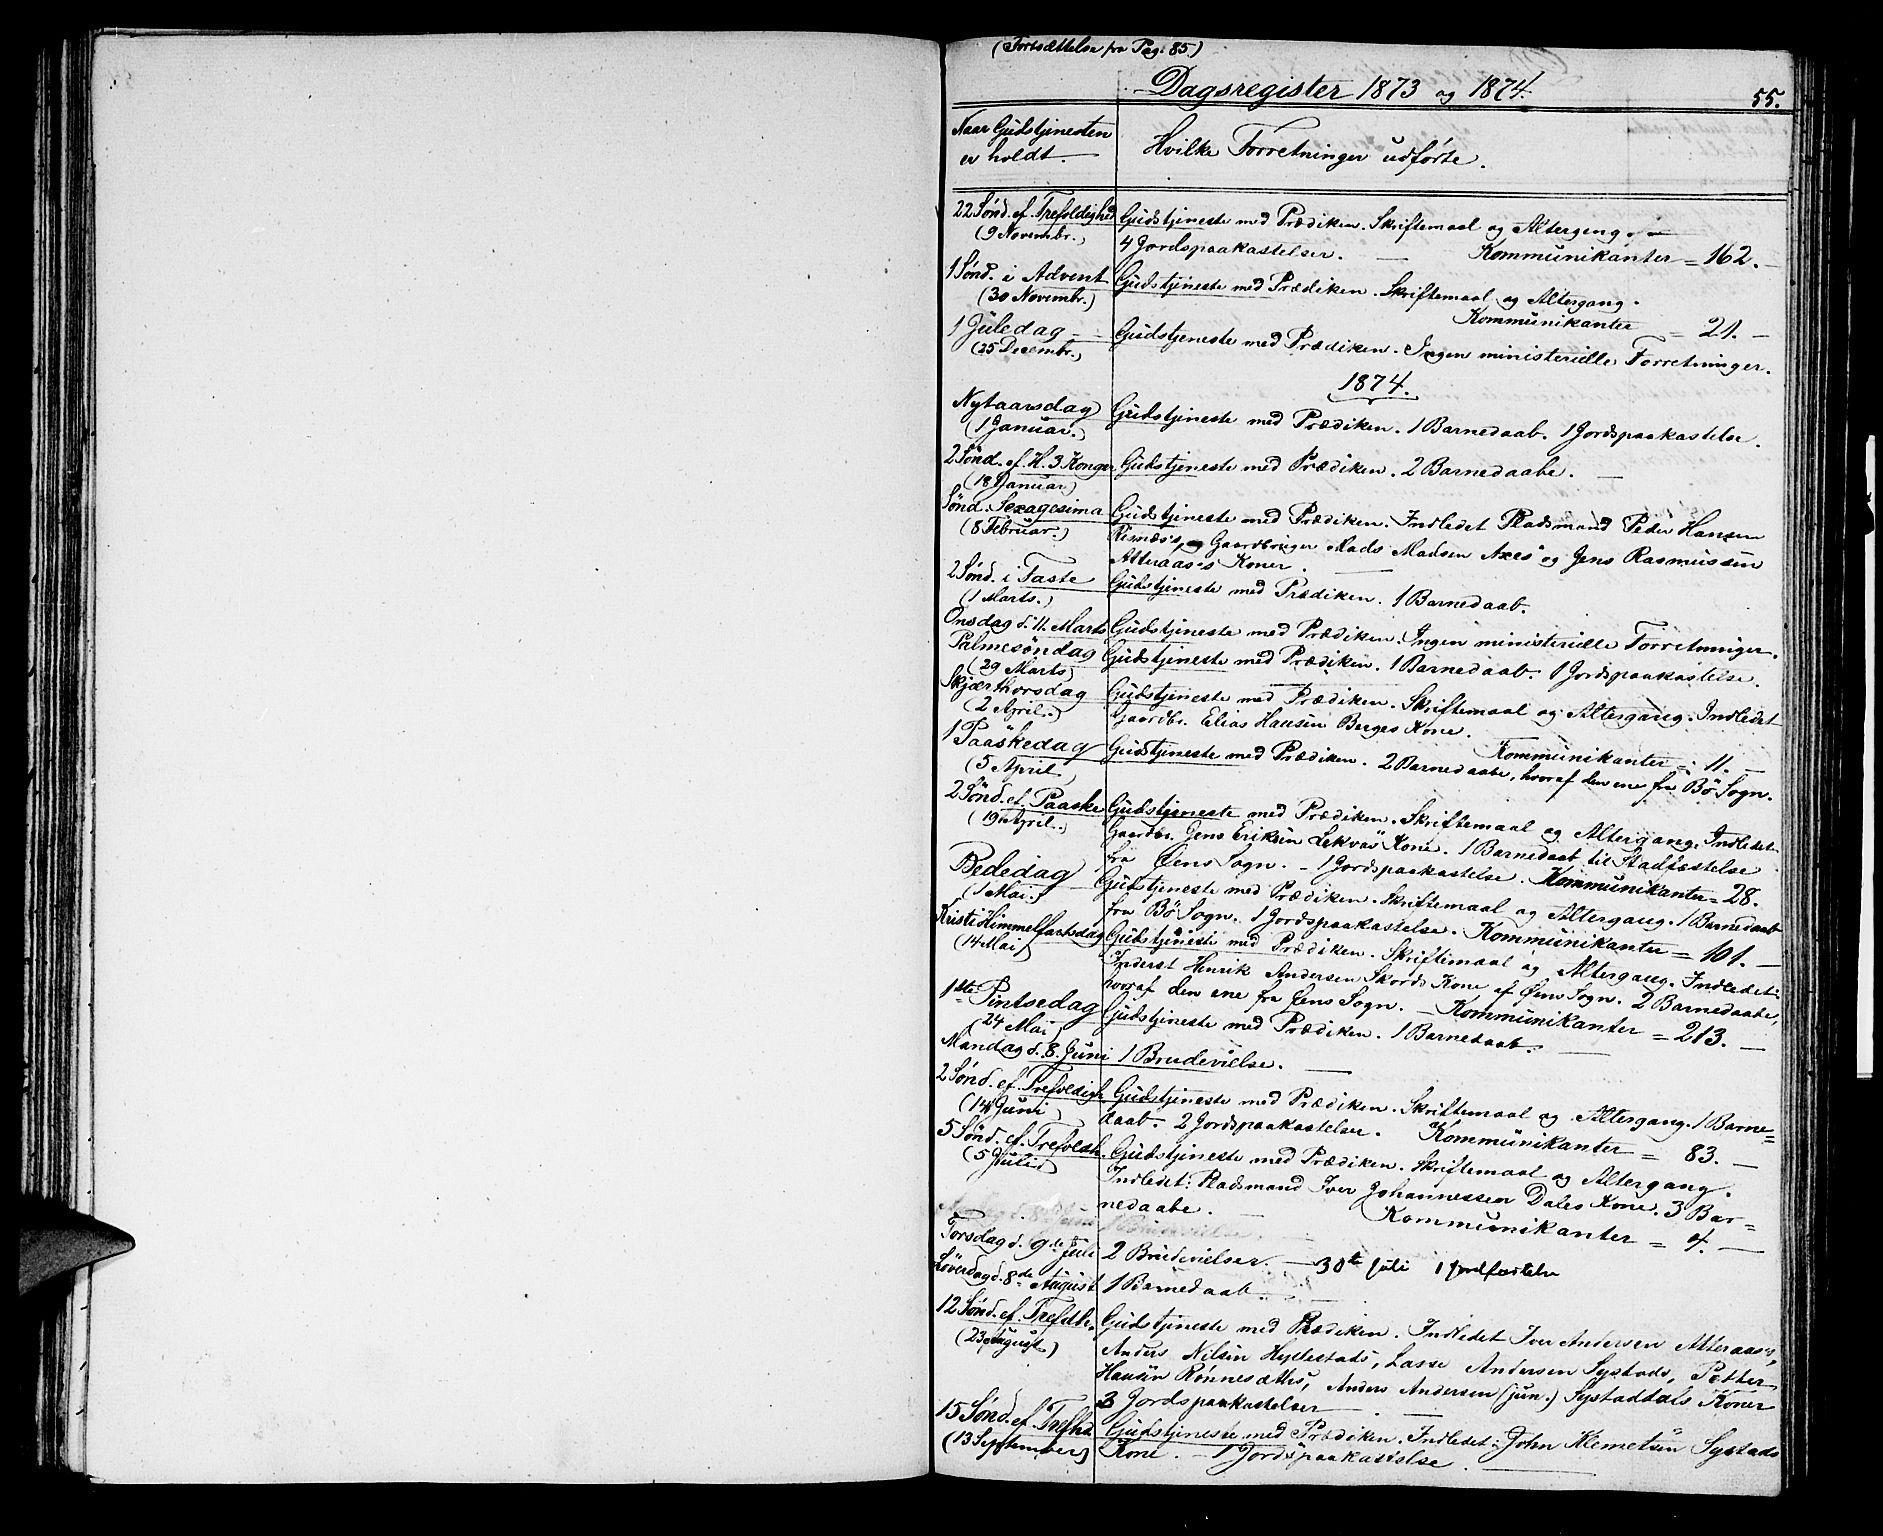 SAB, Hyllestad Sokneprestembete, Klokkerbok nr. A 1, 1853-1875, s. 55